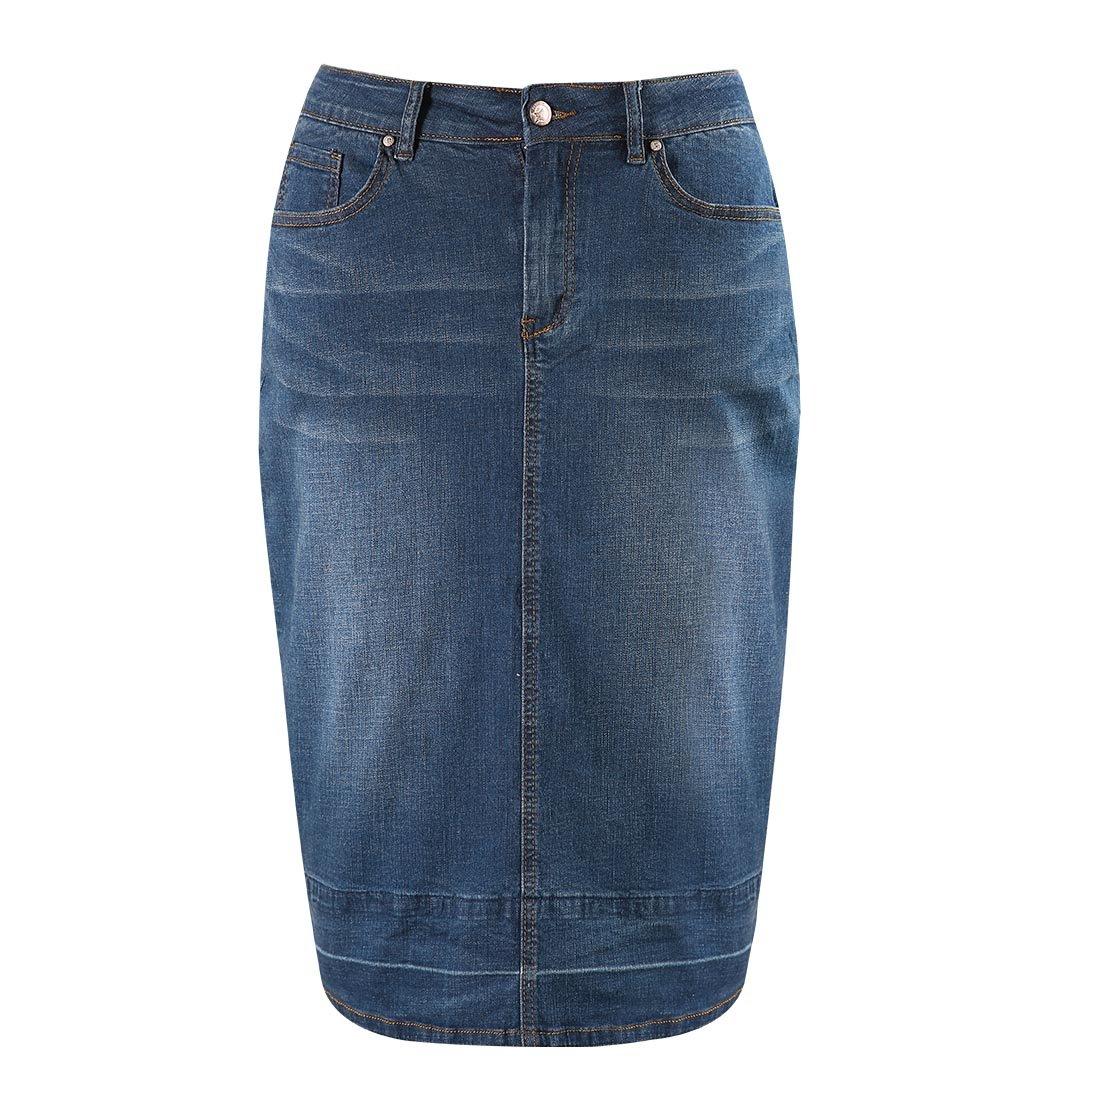 MSSHE Women's Knee Length Denim Pencil Jean Skirts Plus Size 18W by MSSHE